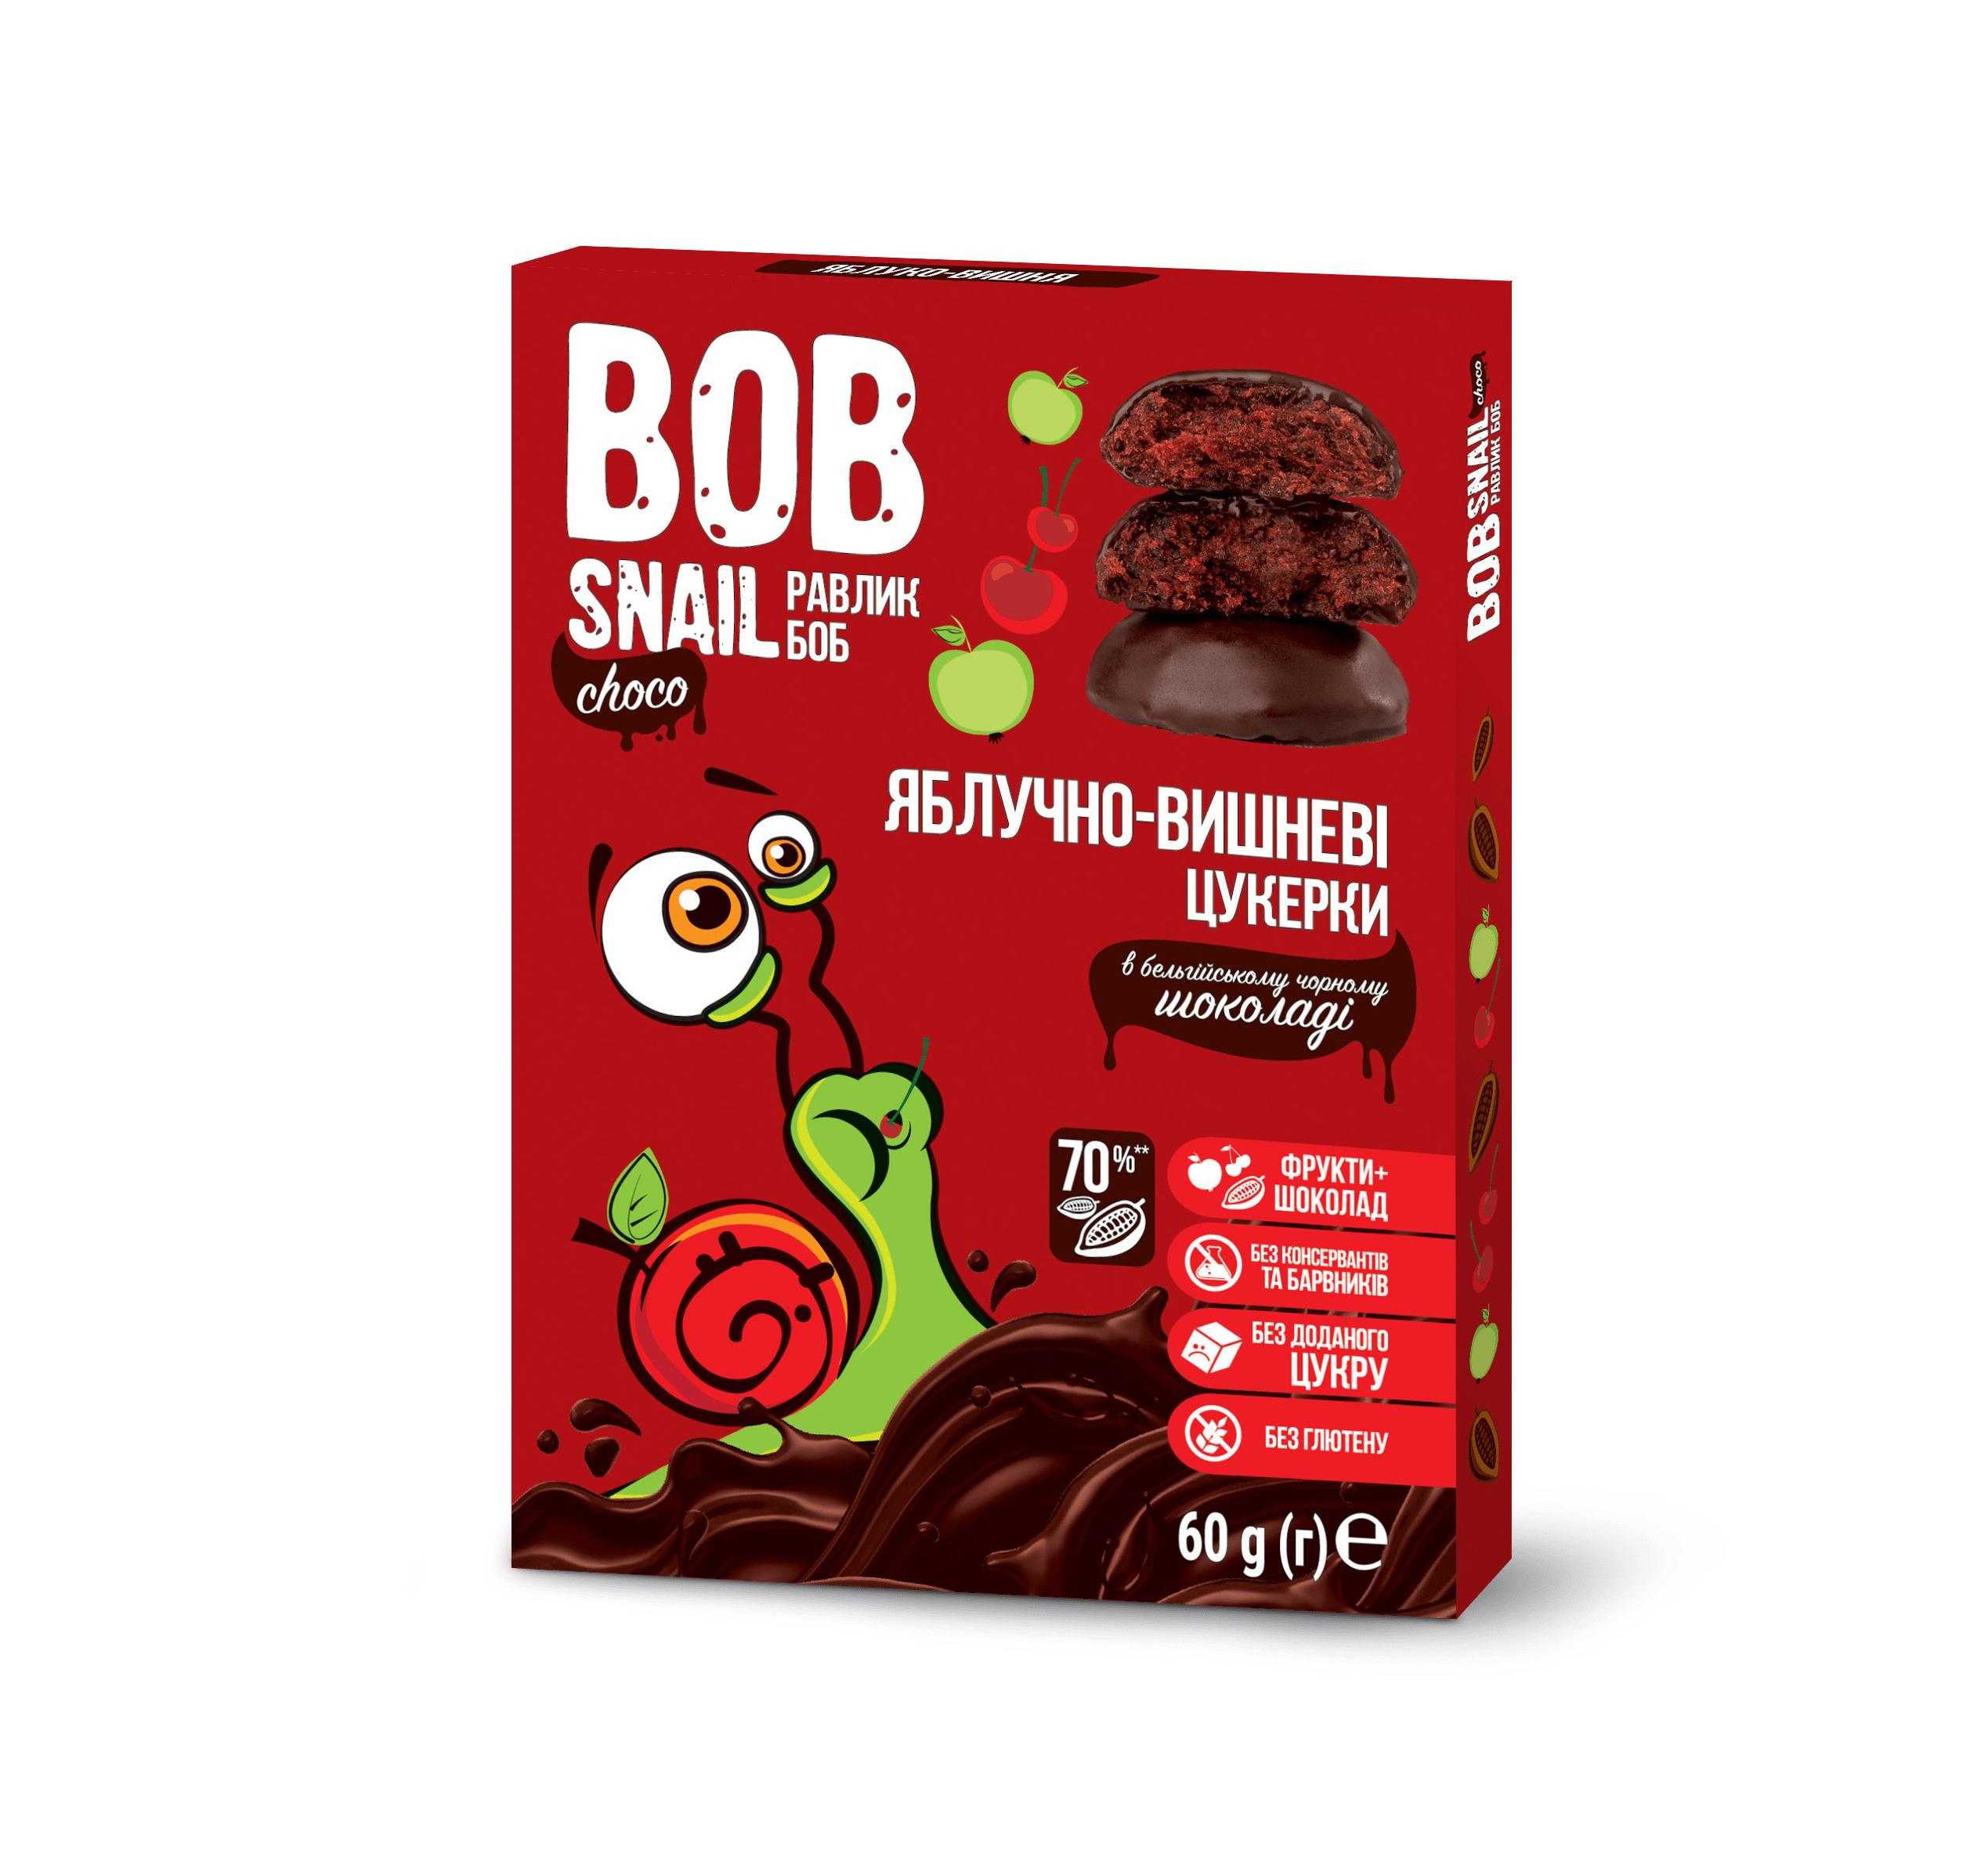 Цукерки Равлик Боб 60г яблуко вишня бельг.черн.шоколад